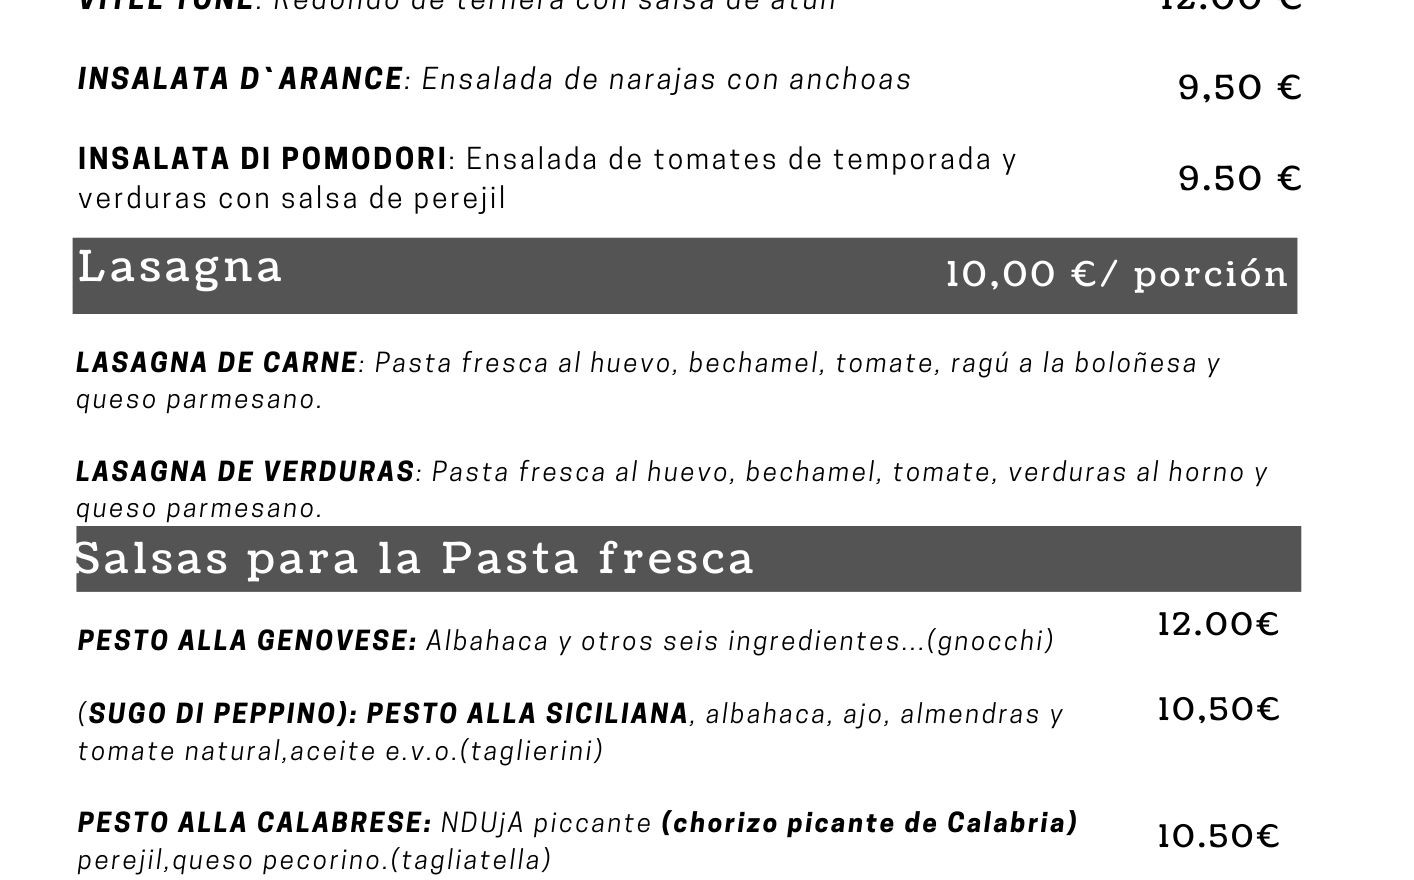 boccone junio (1).jpg